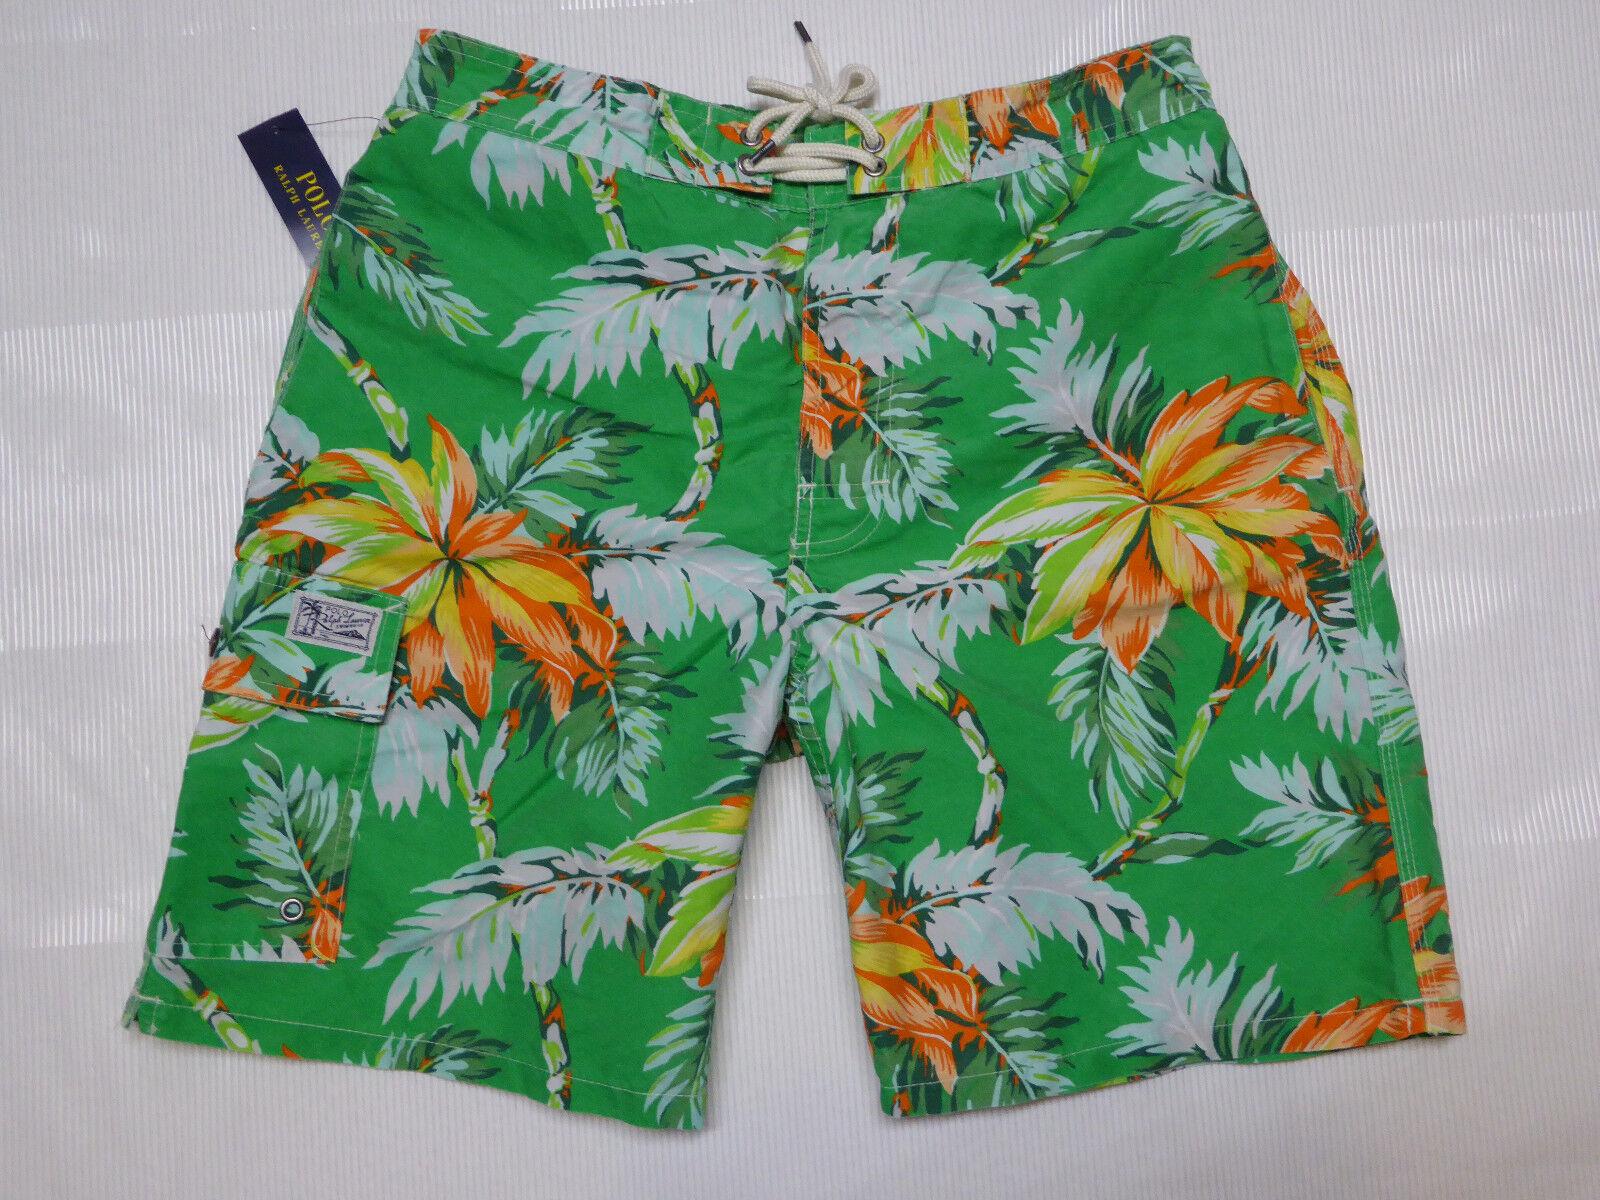 02af29823e Polo RALPH LAUREN Maine Green Palm Swim Shorts Trunks LG MD Tropical Flowers